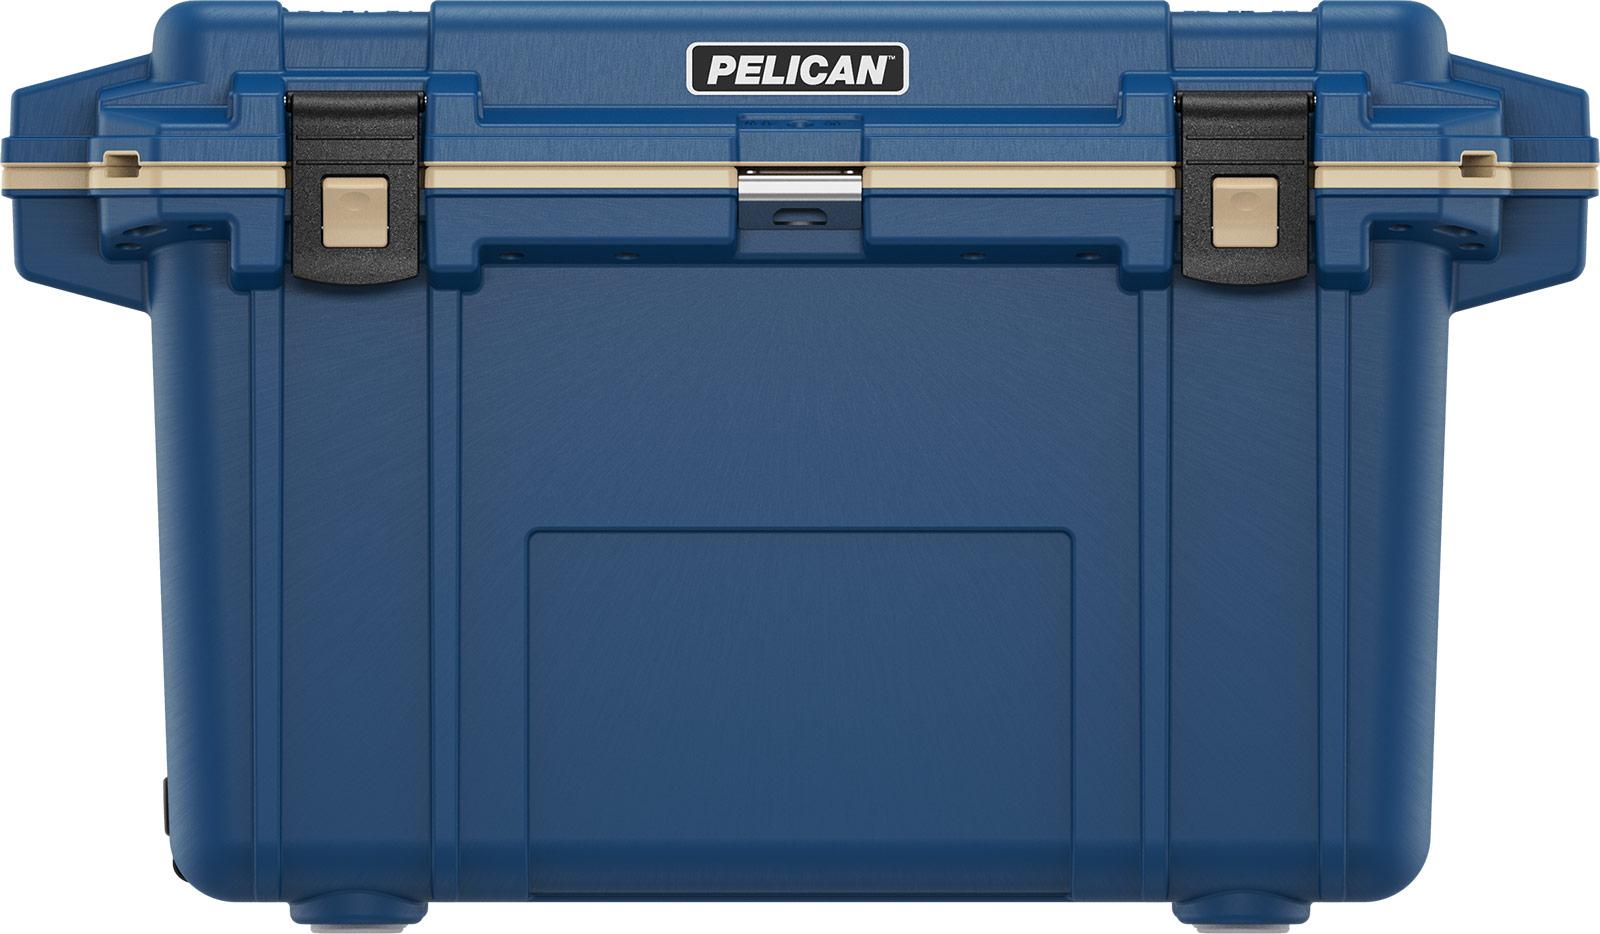 pelican blue cooler 70qt overland coolers